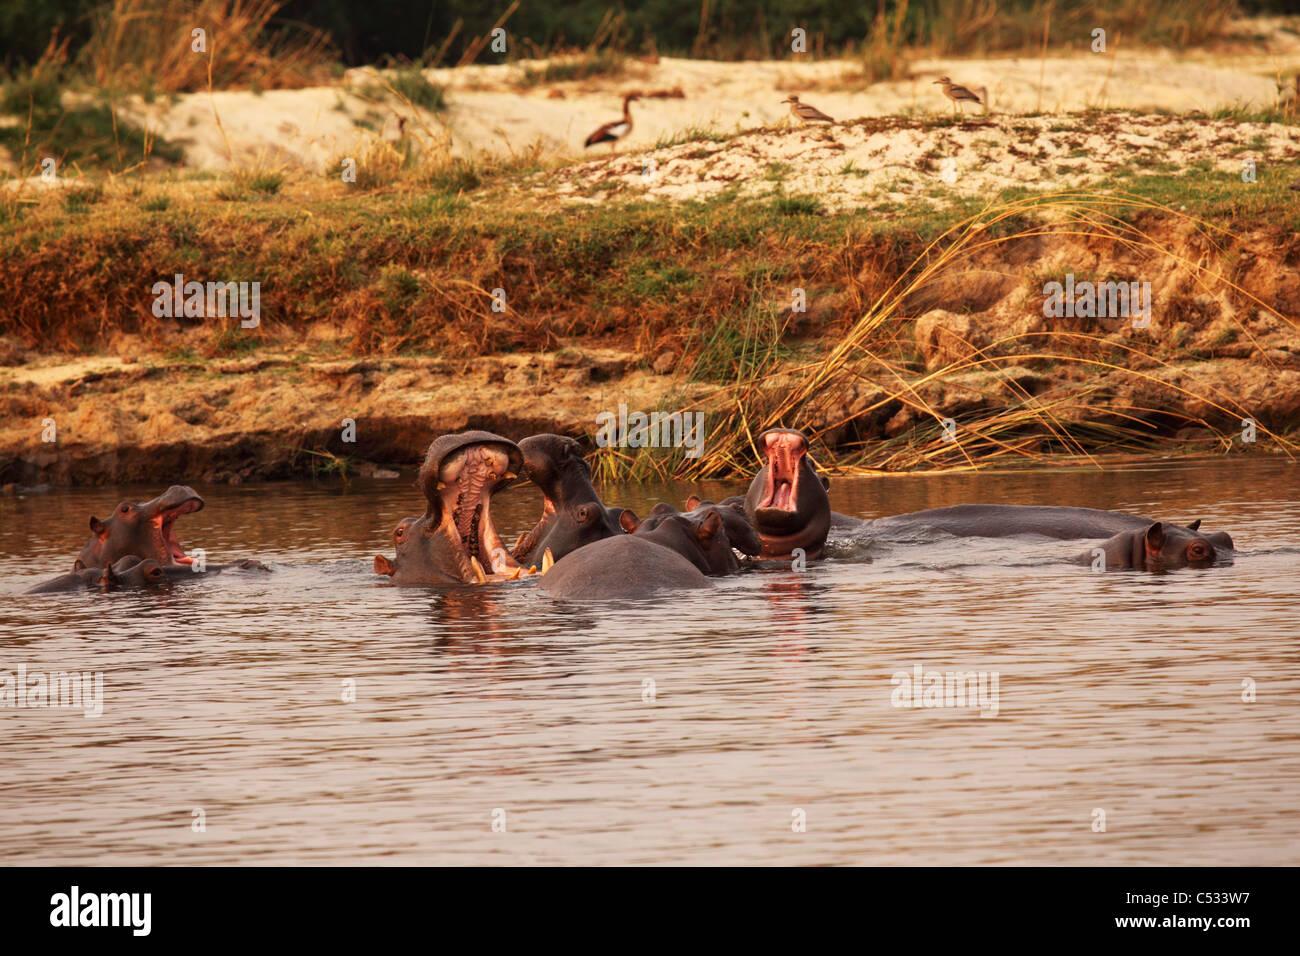 A group of Hippopotamus in the Zambezi River close to the Victoria Falls, Zimbabwe. Stock Photo